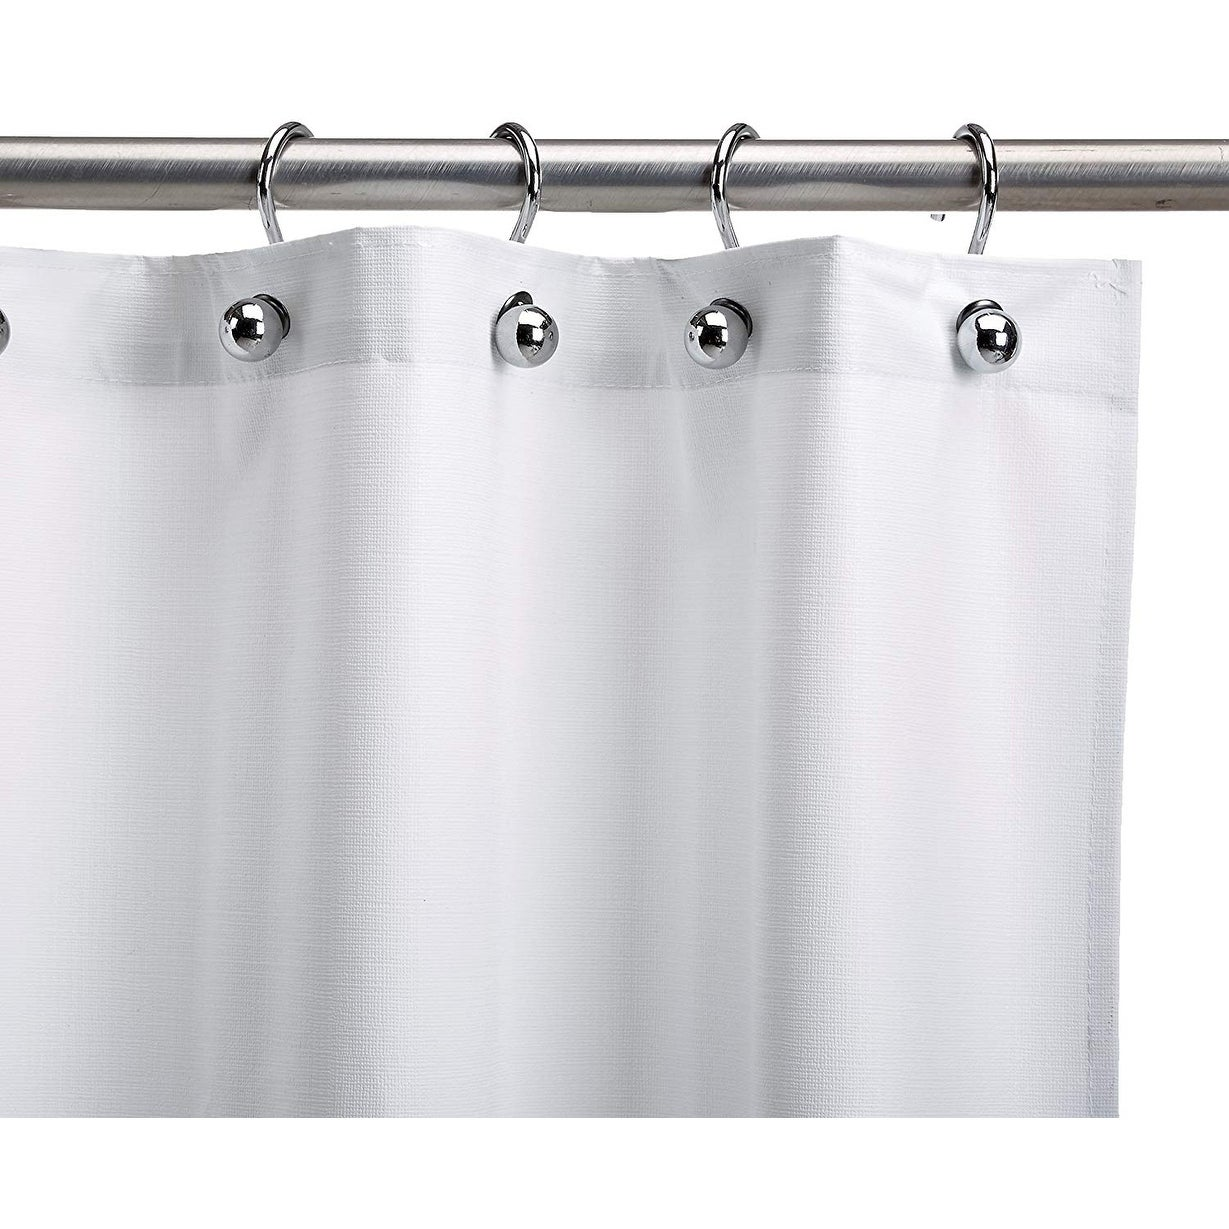 Csi Assure Heavy Duty White Vinyl Shower Curtain